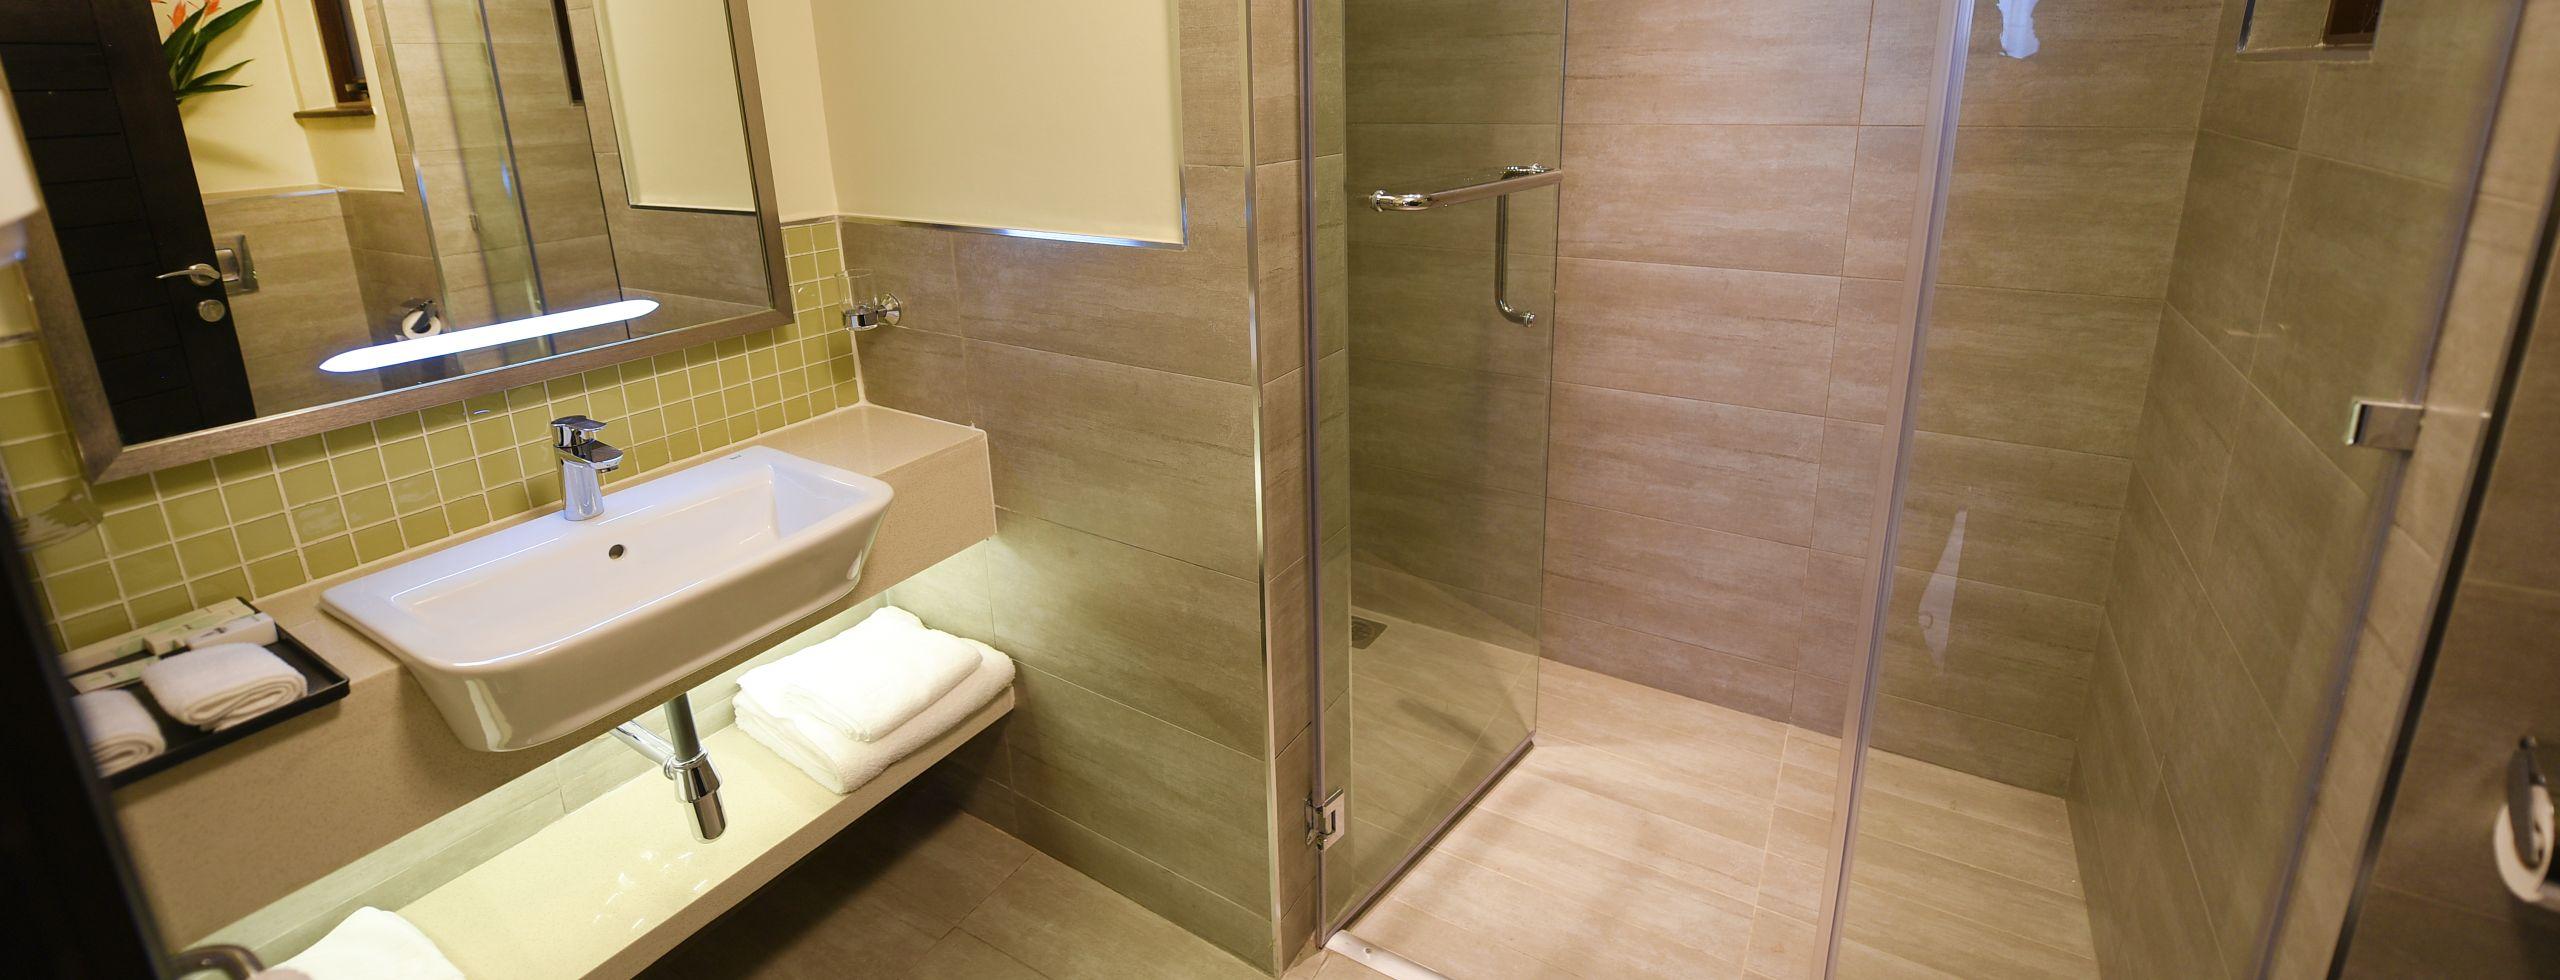 Accommodation 2 bed 5 bathroom